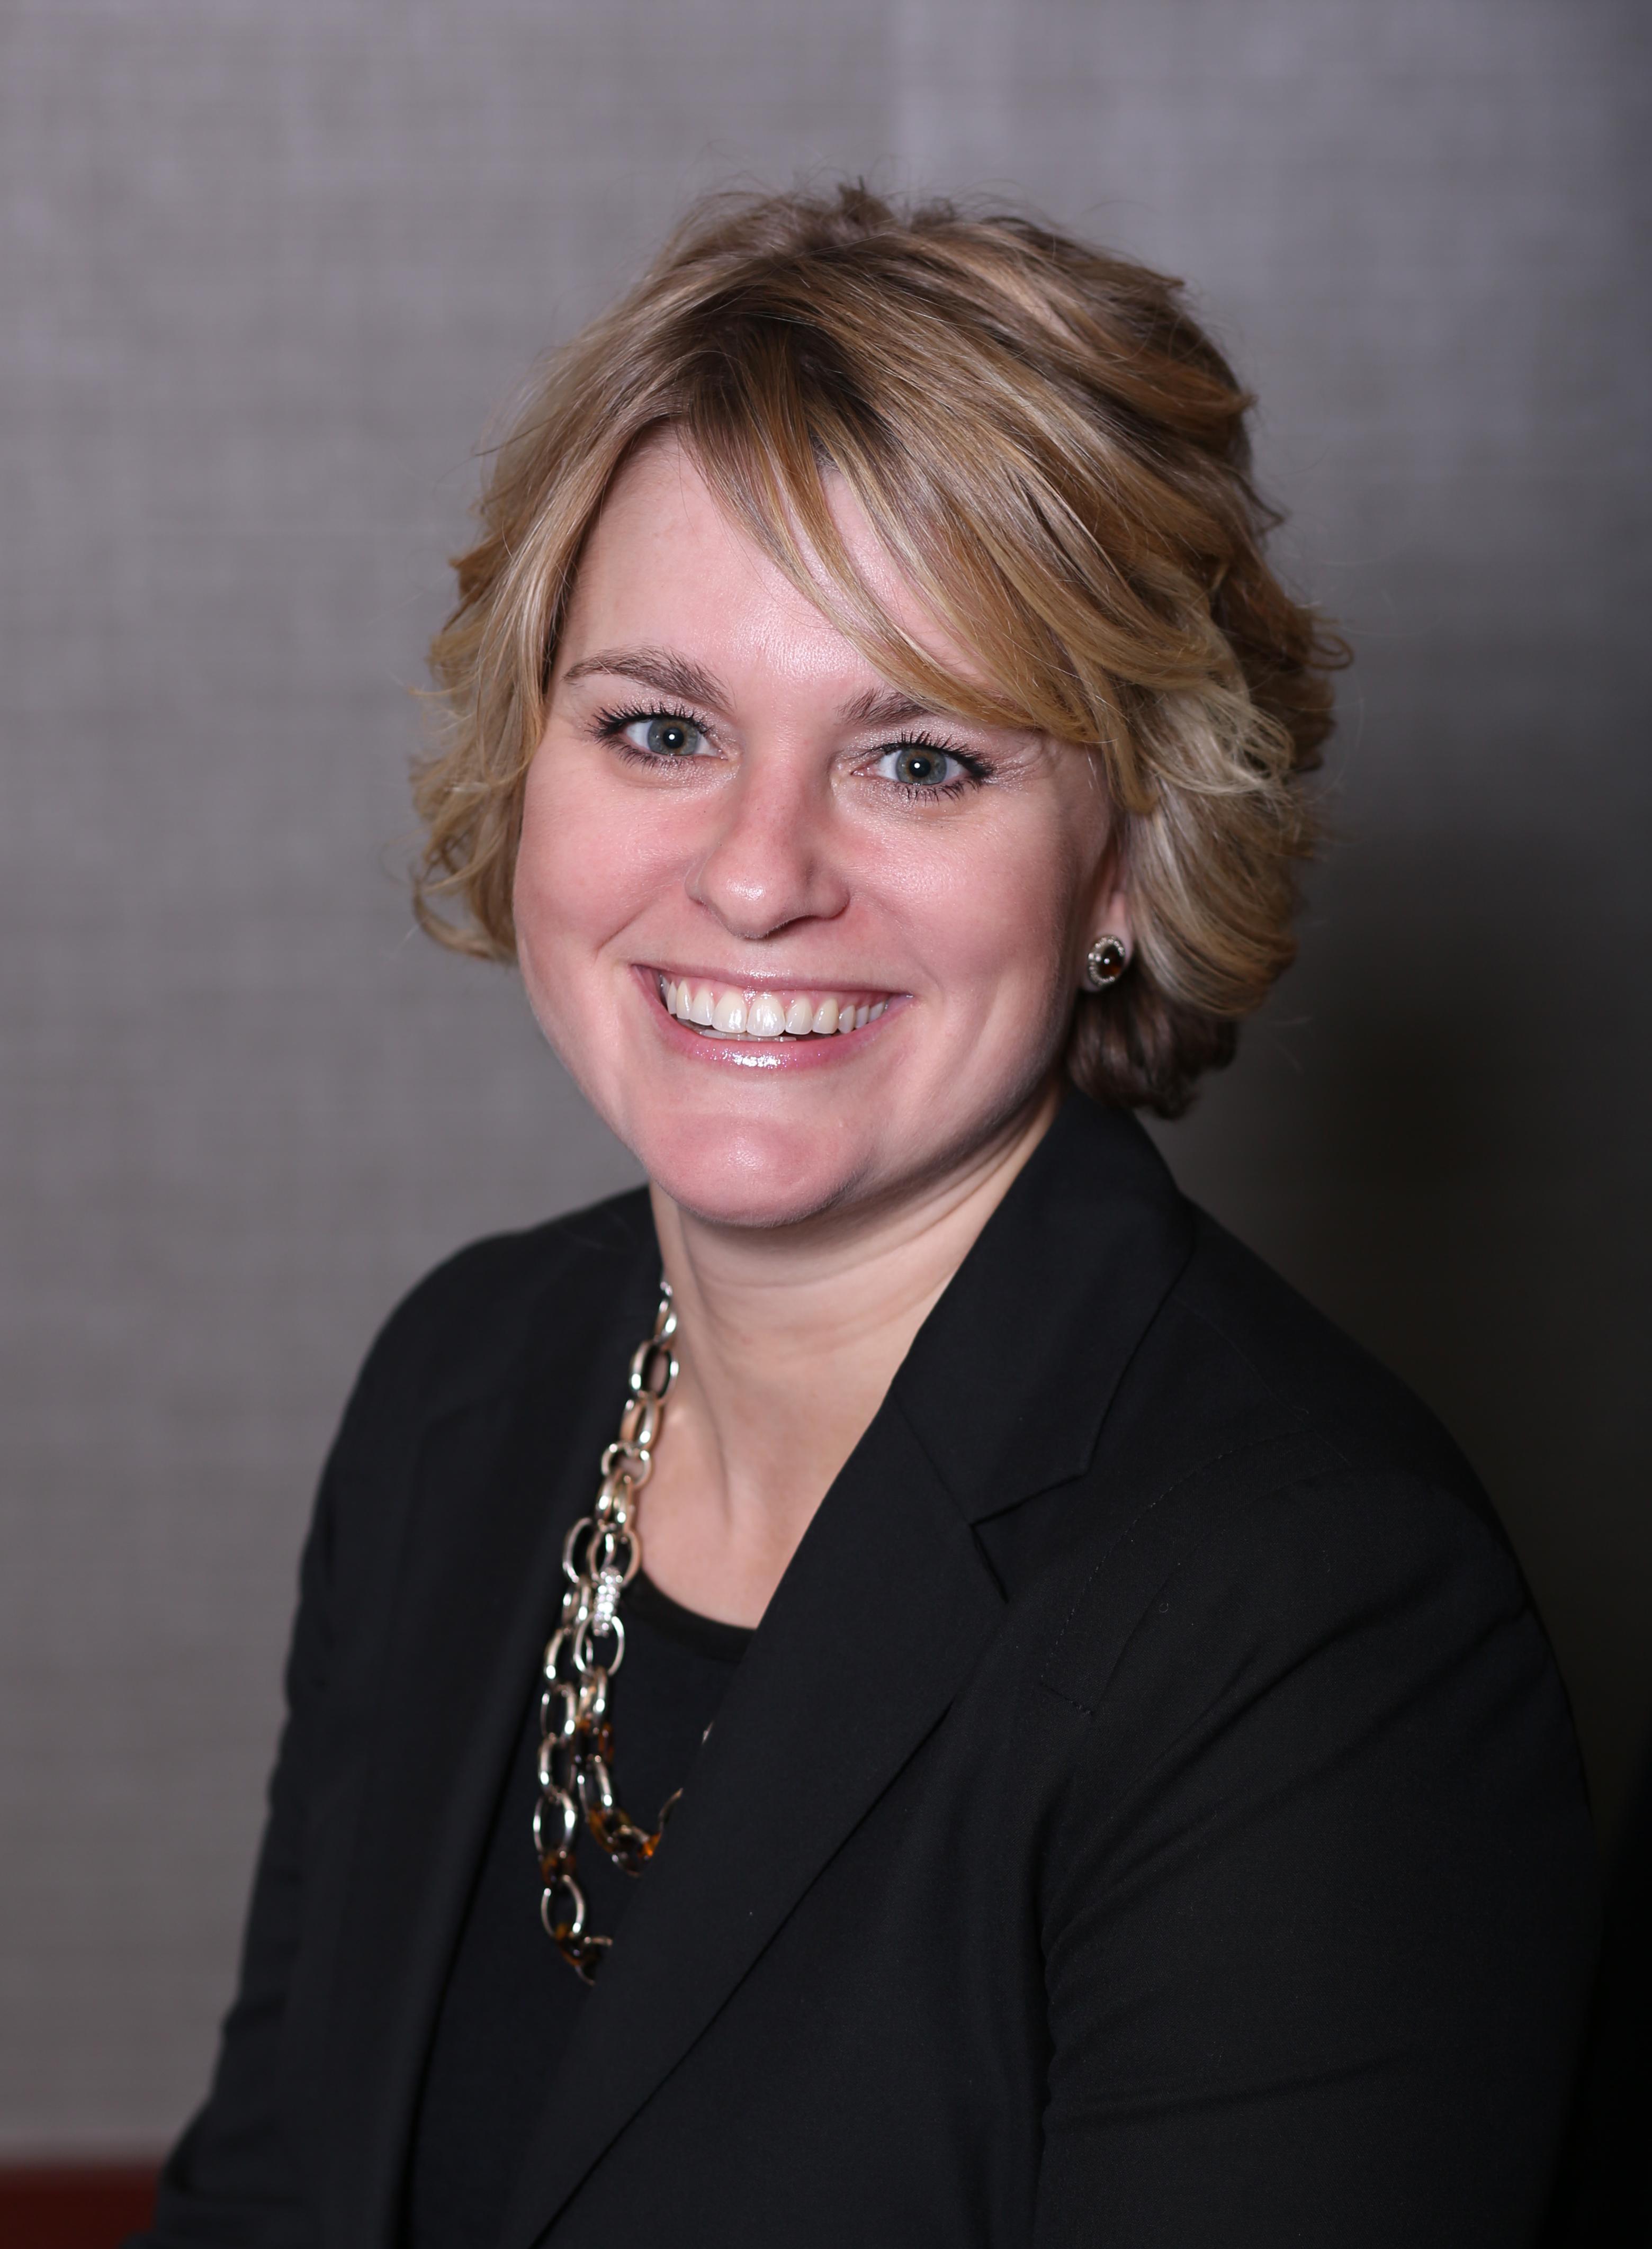 Betsy McVay